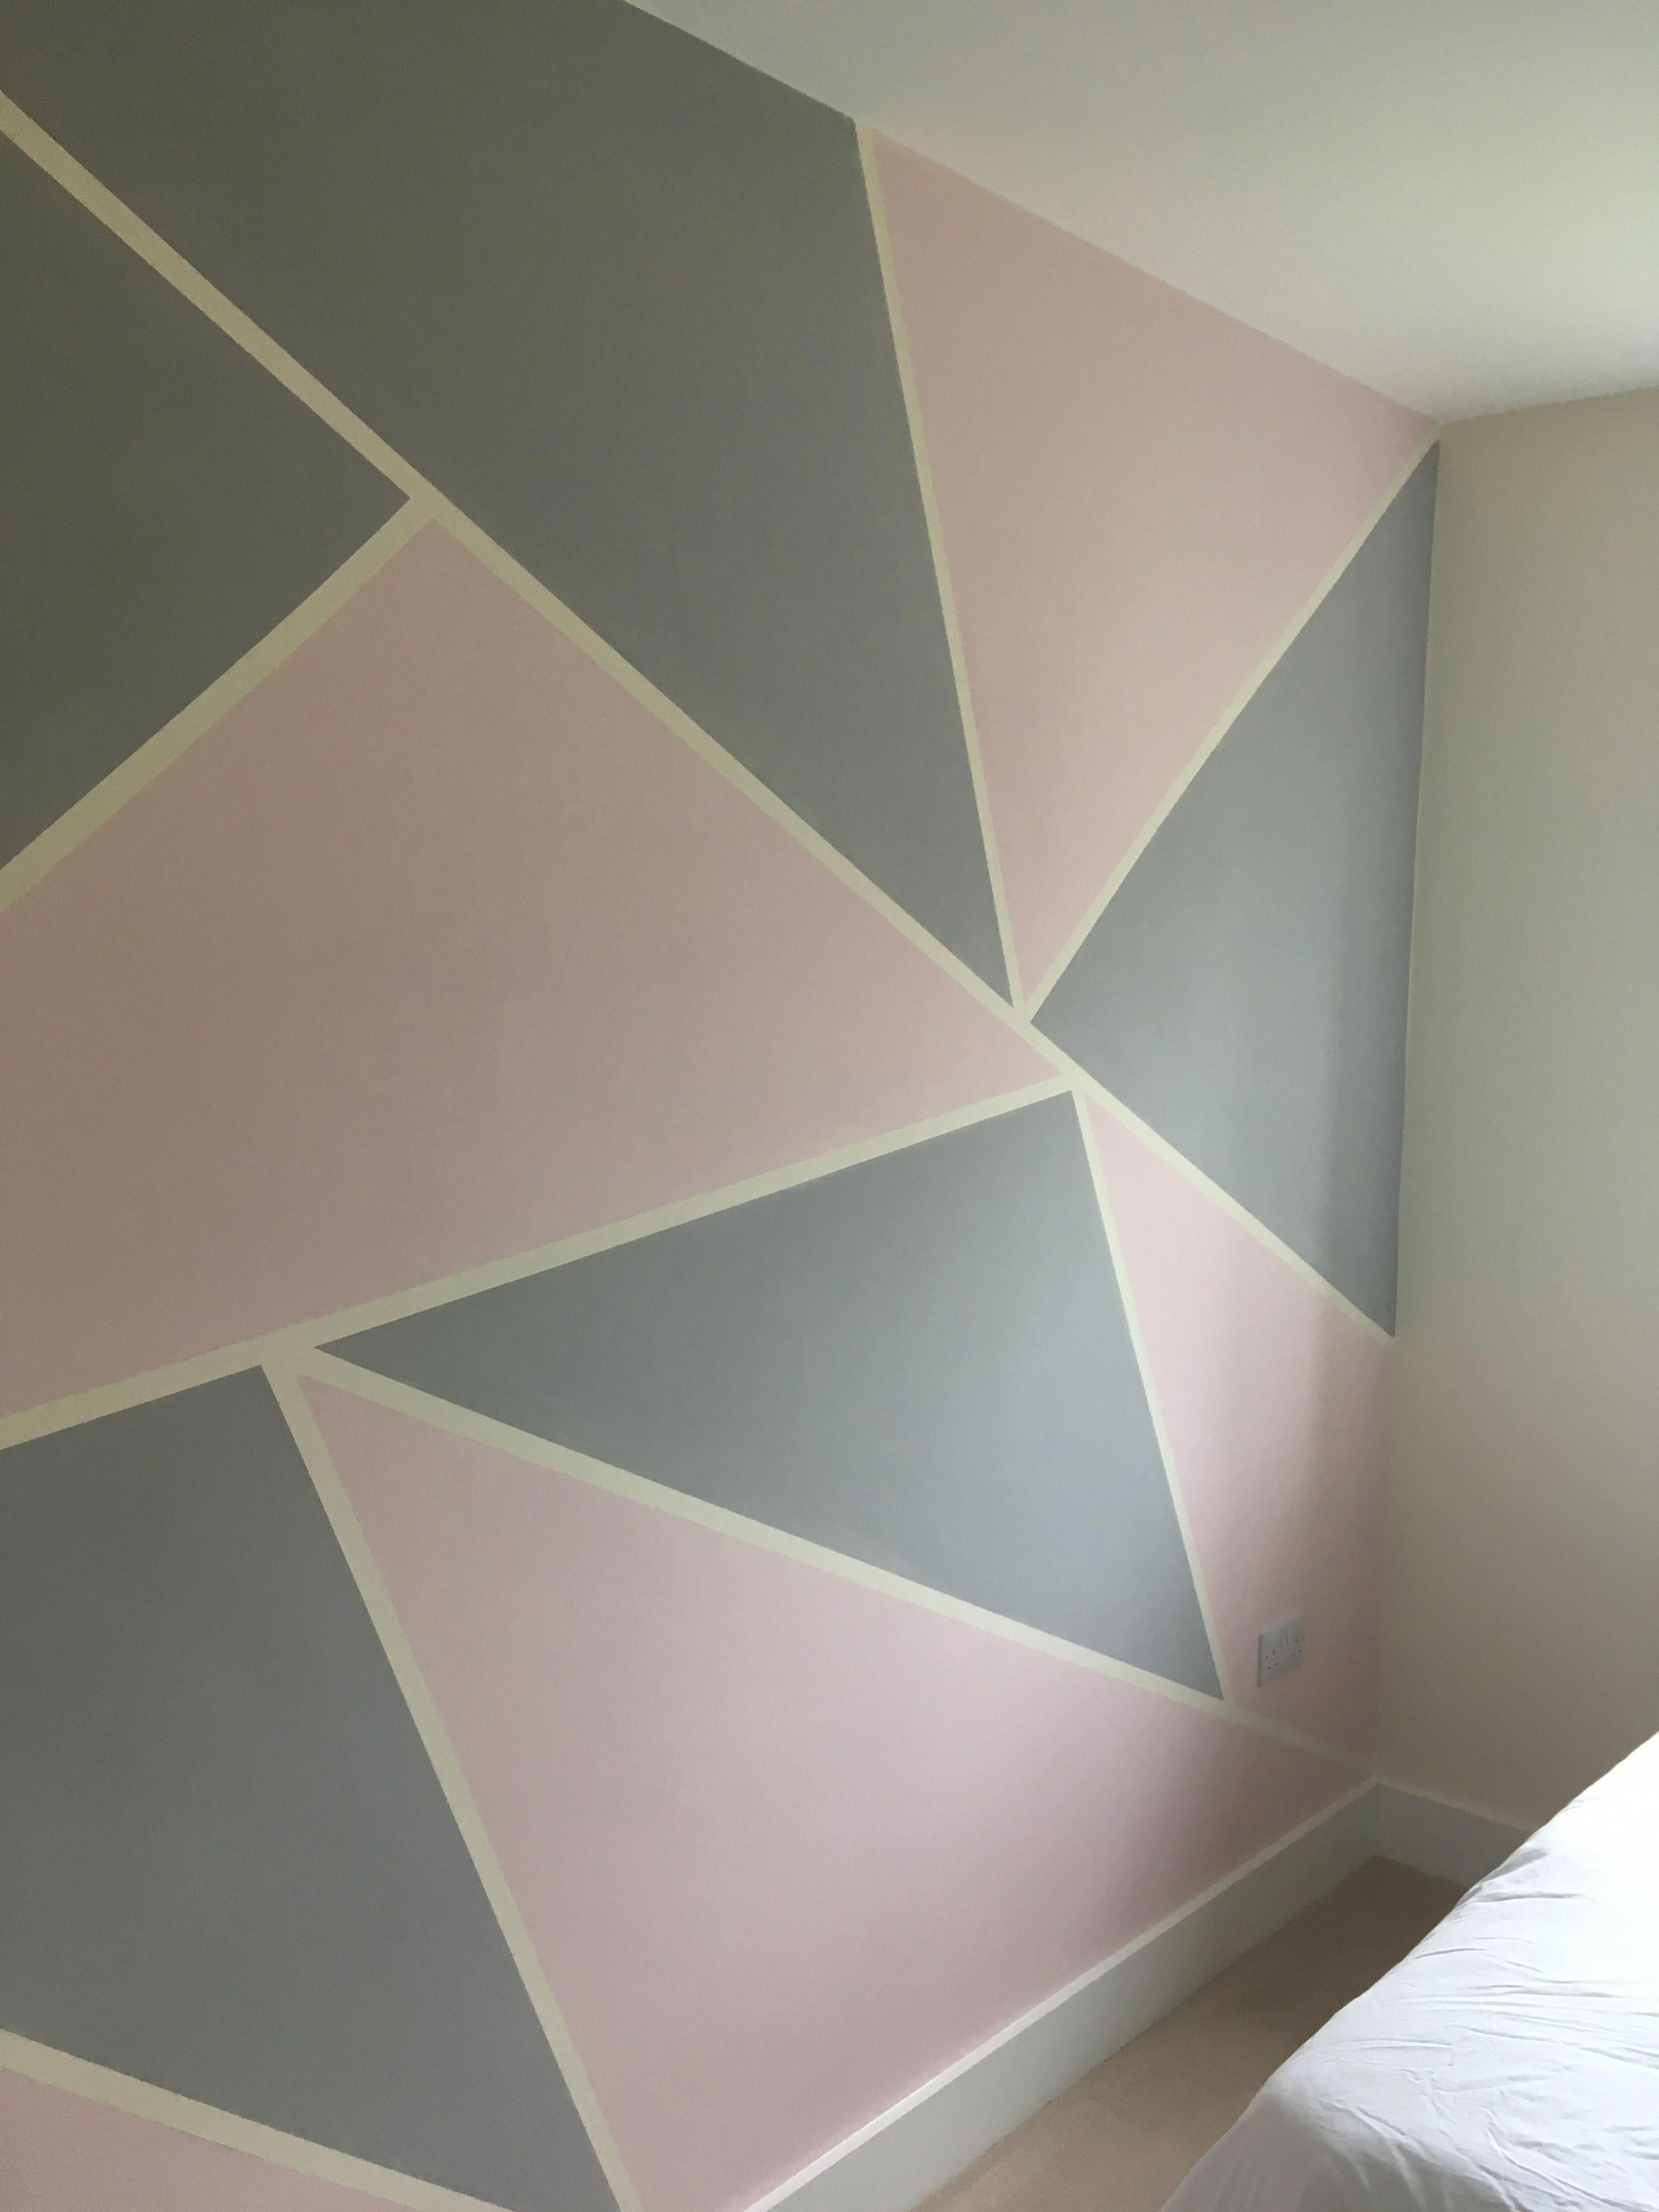 Using Masking Tape To Create A Feature Wall Pinkandgoldbedroomideas Girls Room Paint Bedroom Wall Paint Bedroom Wall Designs